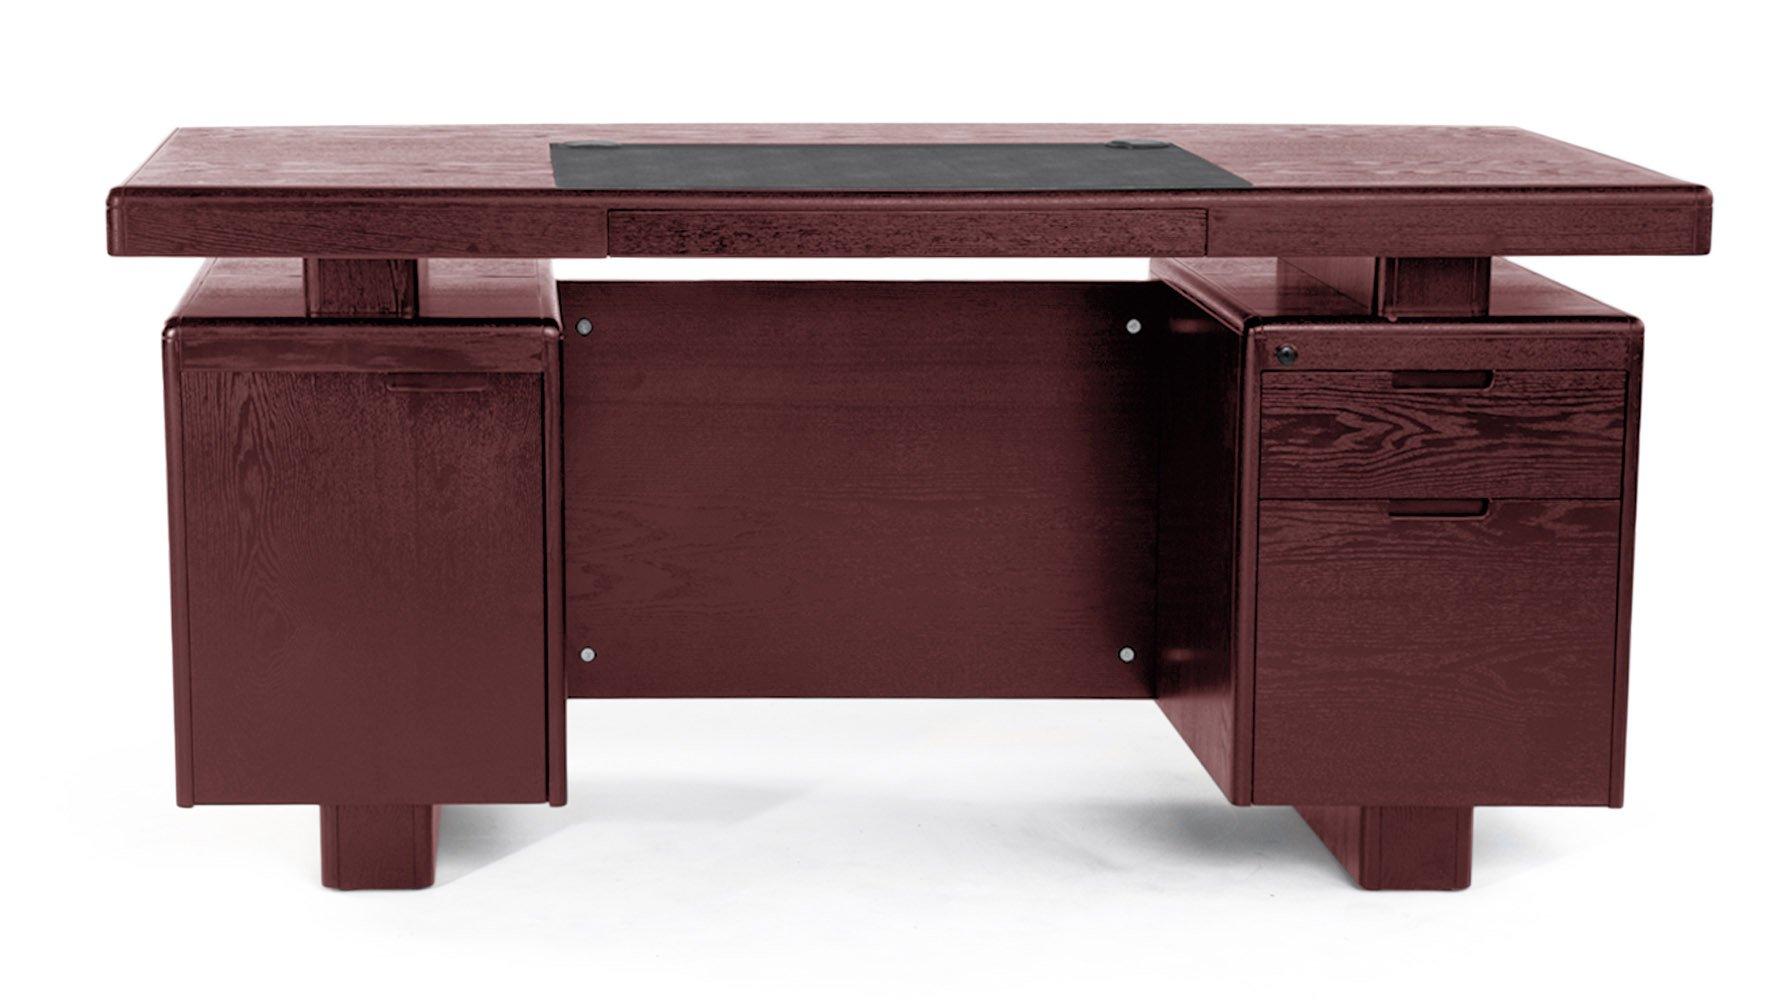 monroe mahogany wood modern desk with leather pad and storage zuri furniture. Black Bedroom Furniture Sets. Home Design Ideas